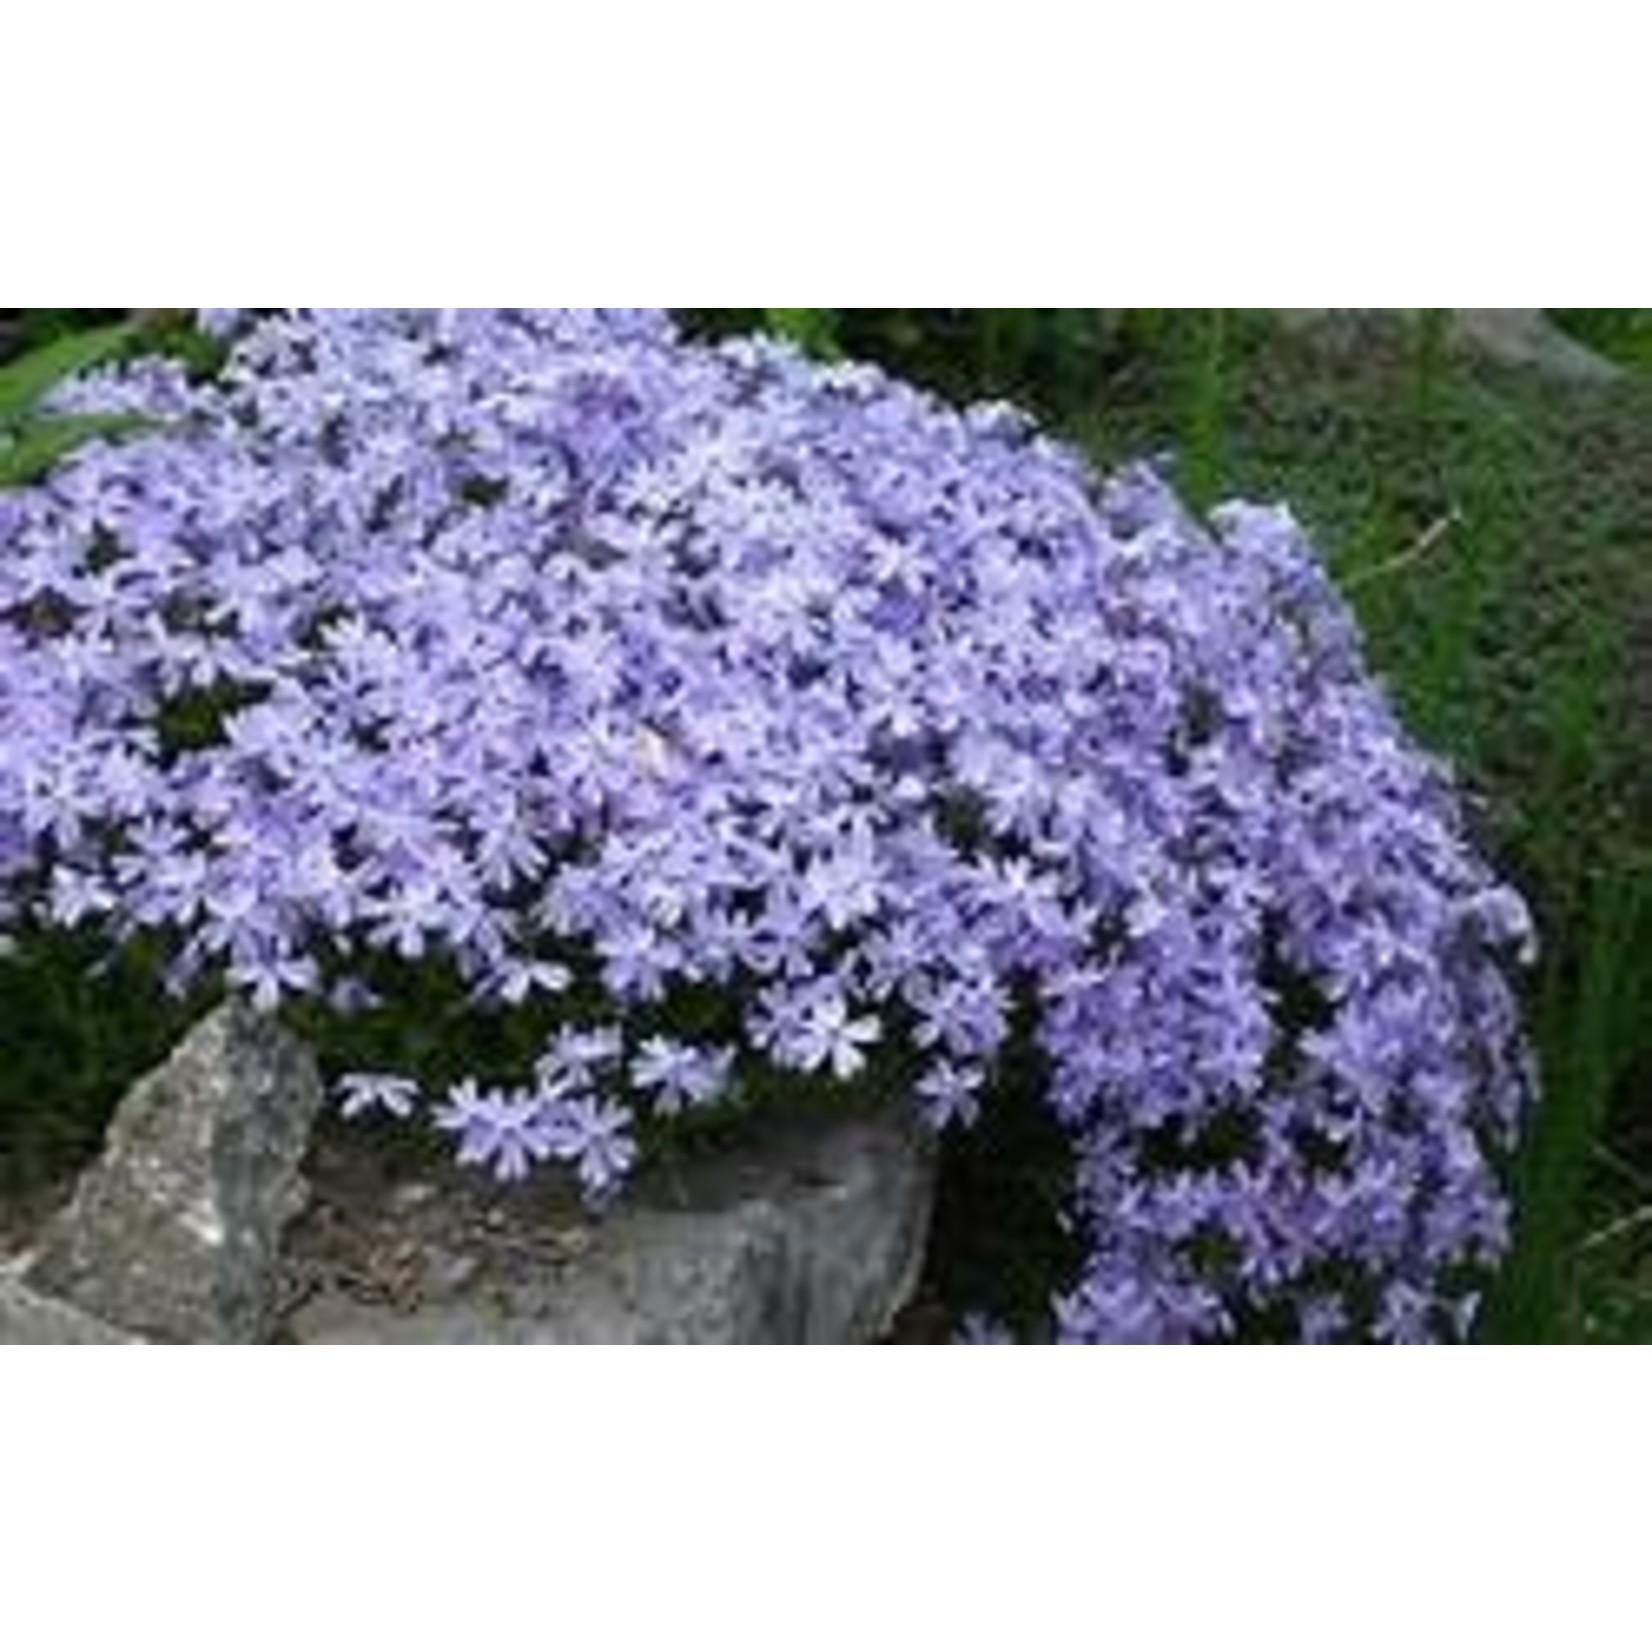 "4"" Perennial\ Creeping Phlox - Emerald Blue"